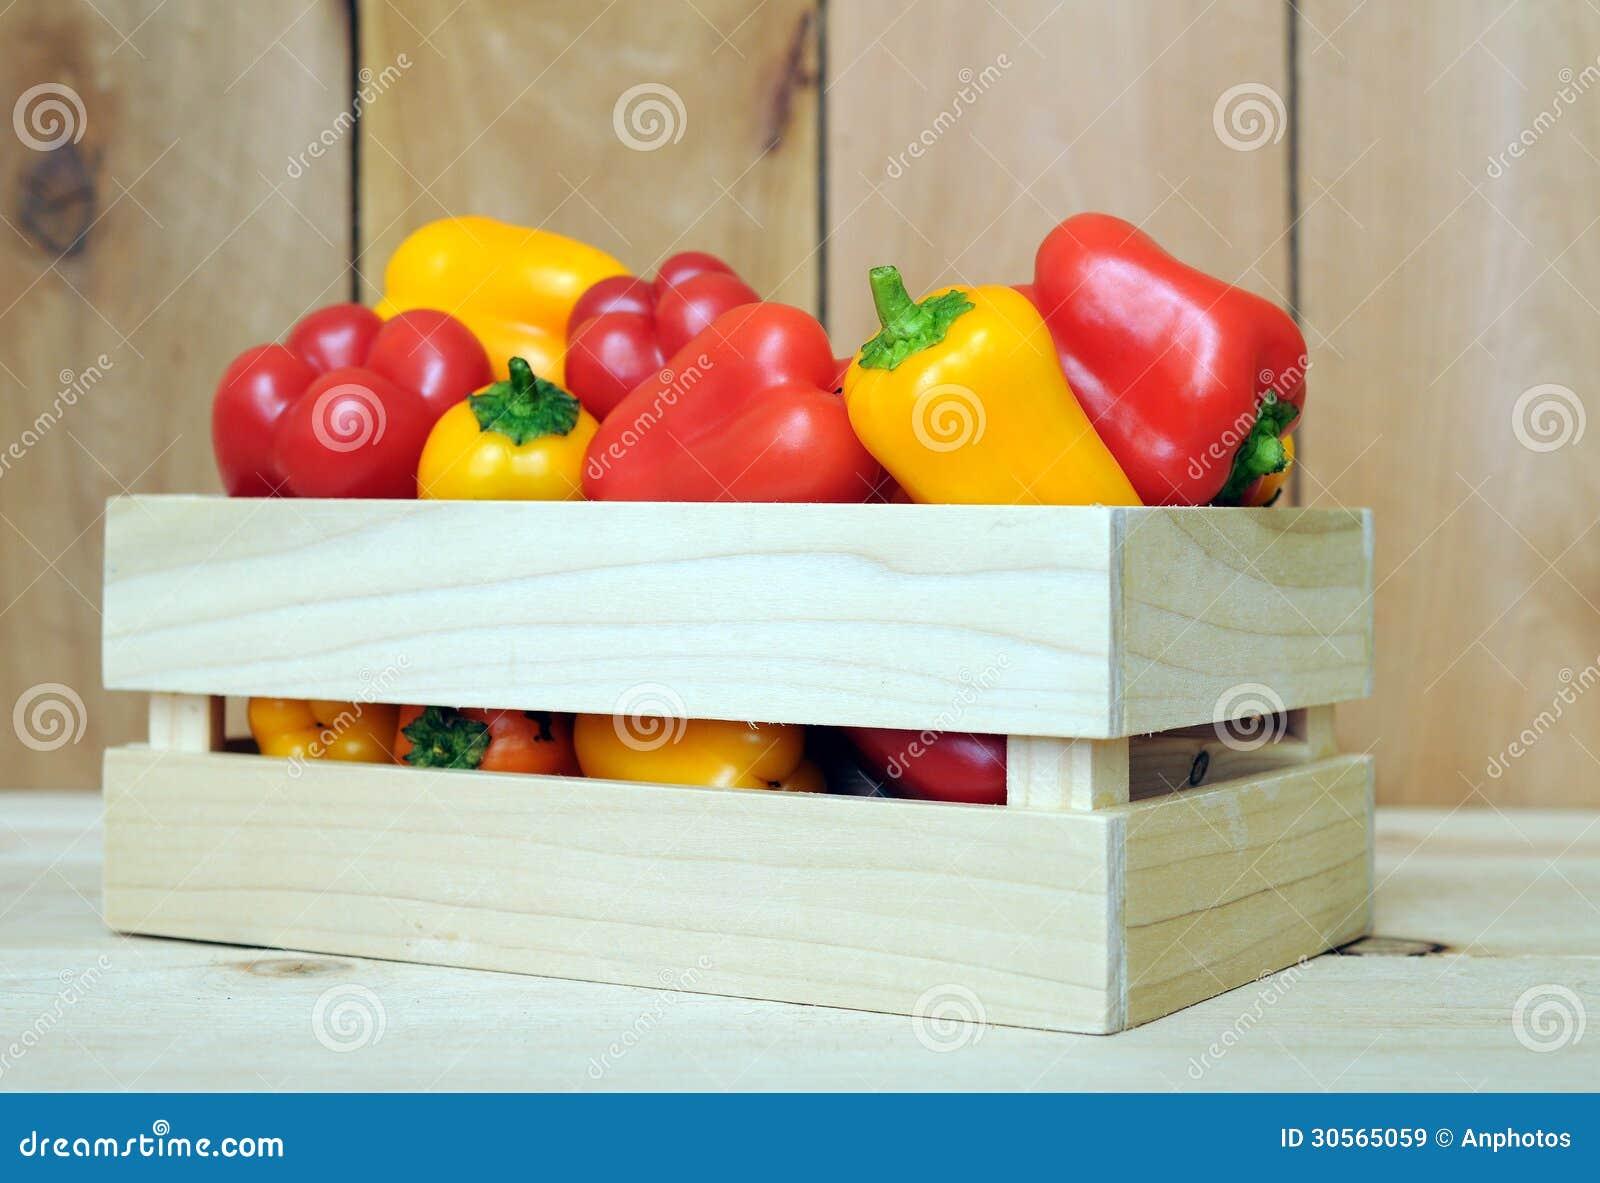 Mini bell pepper